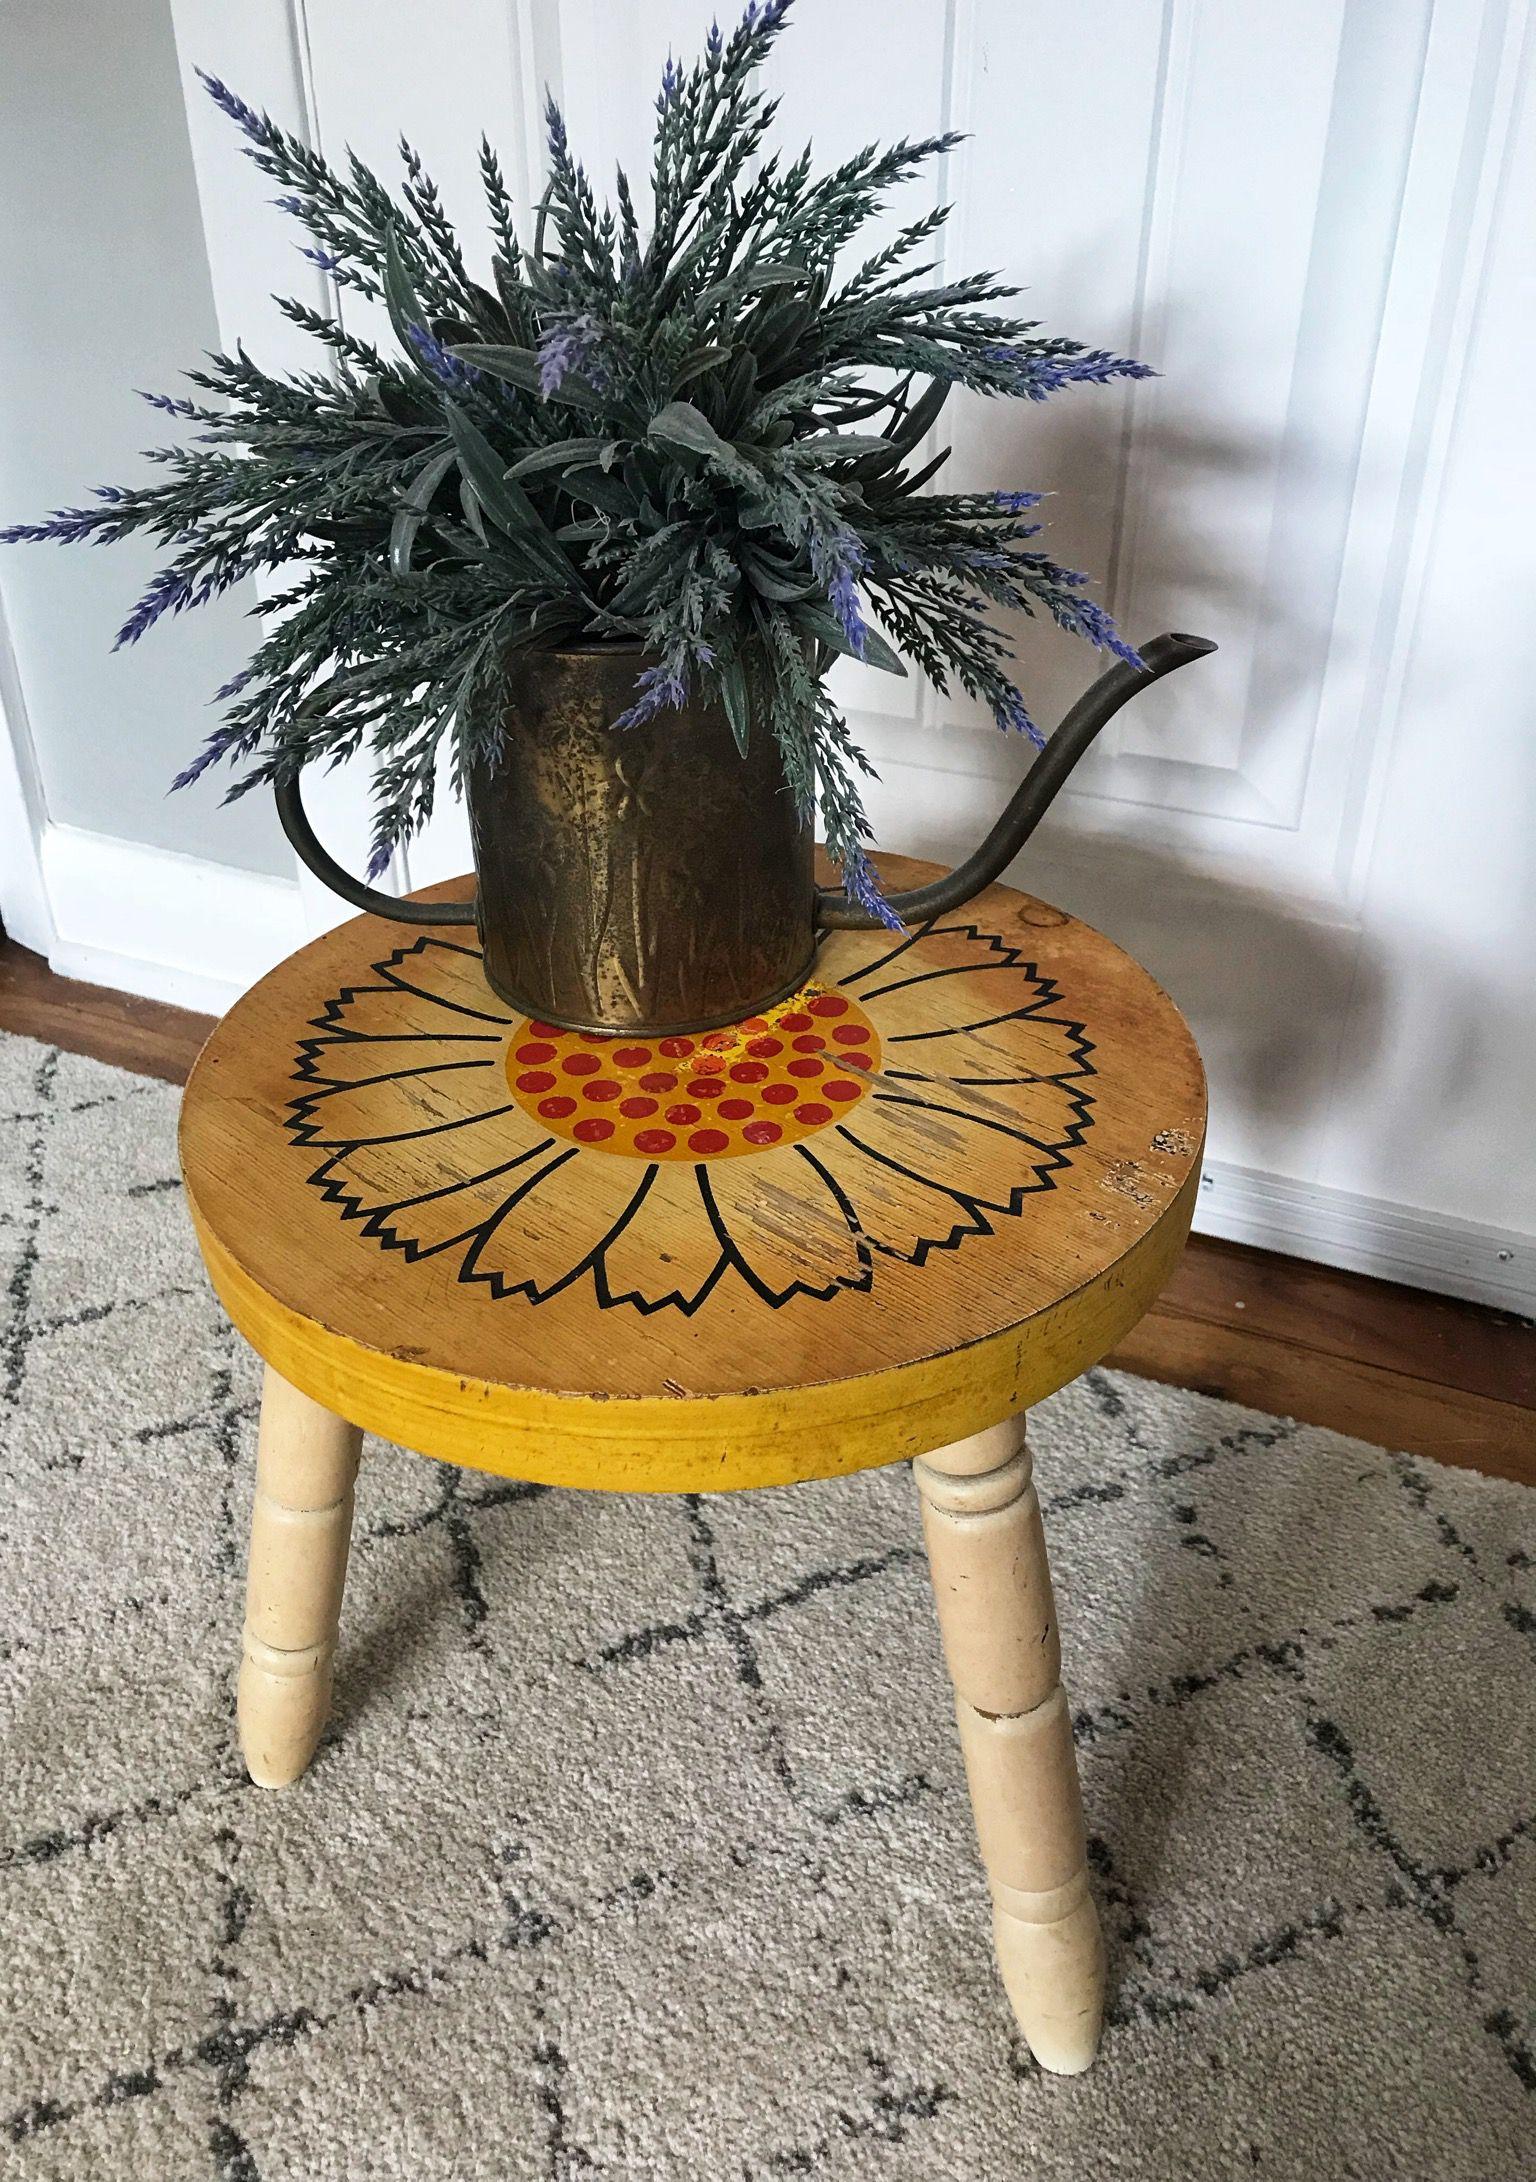 Miraculous Vintage Round Stool Wood Stool Vintage Flower Stool Primitive Stool Flower Ottoman Sunflower Bench Vintage Yellow Stool Cjindustries Chair Design For Home Cjindustriesco